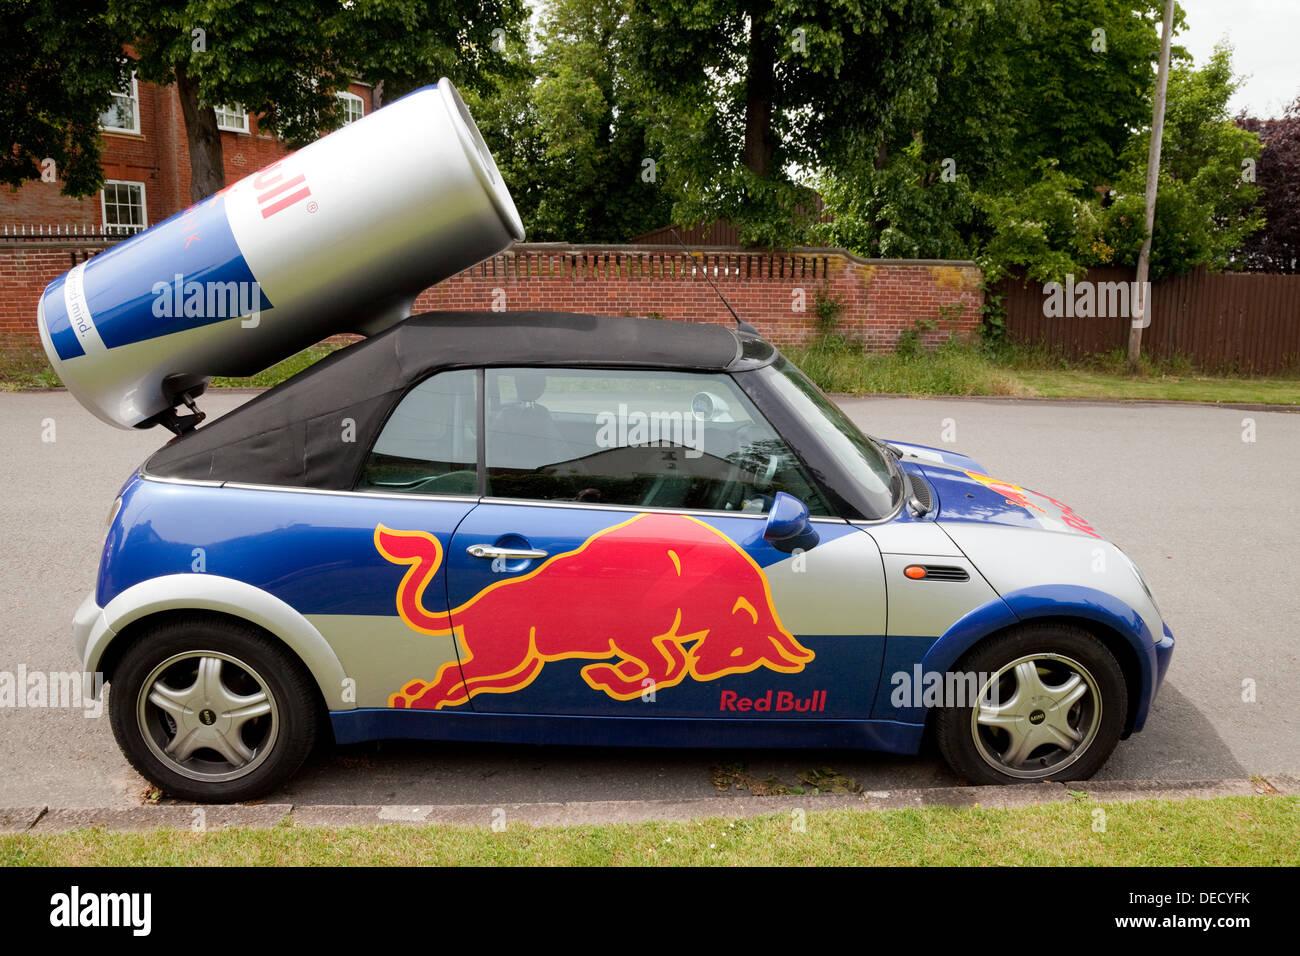 Red Bull mini car, UK Photo Stock